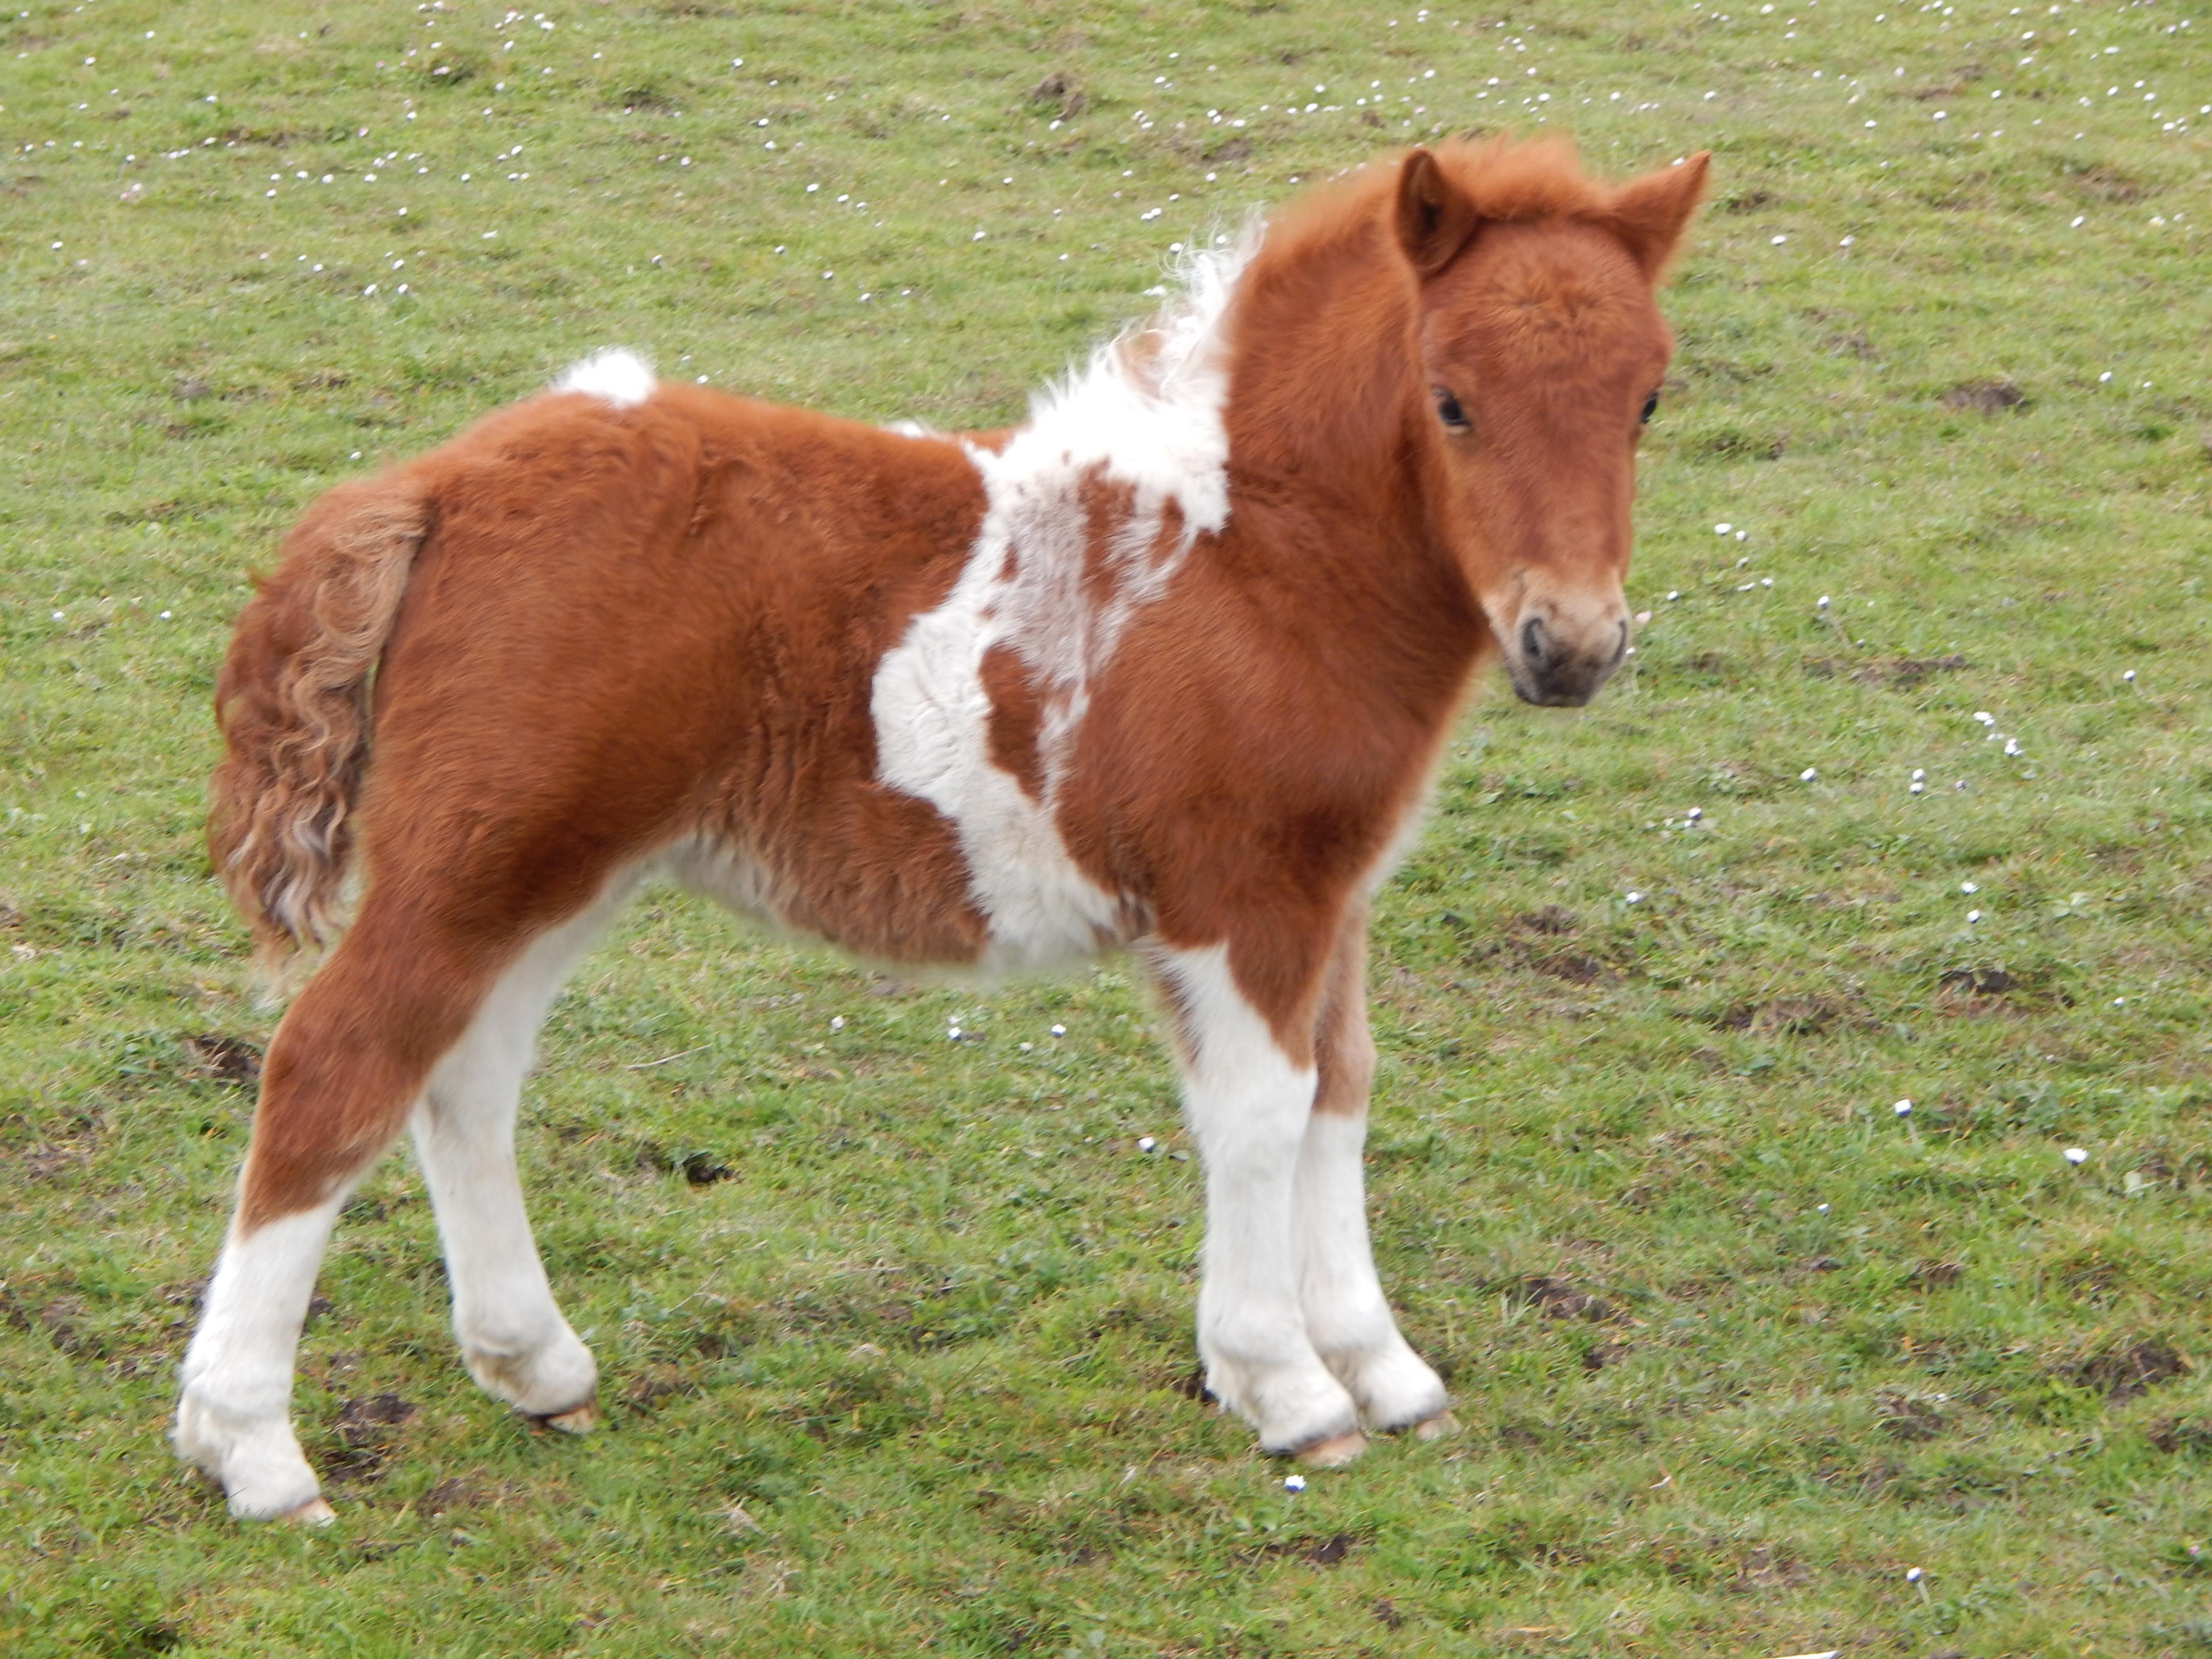 Lot 36 - Skewbald - Standard - Filly Foal, - DOB: 23rd April 2017